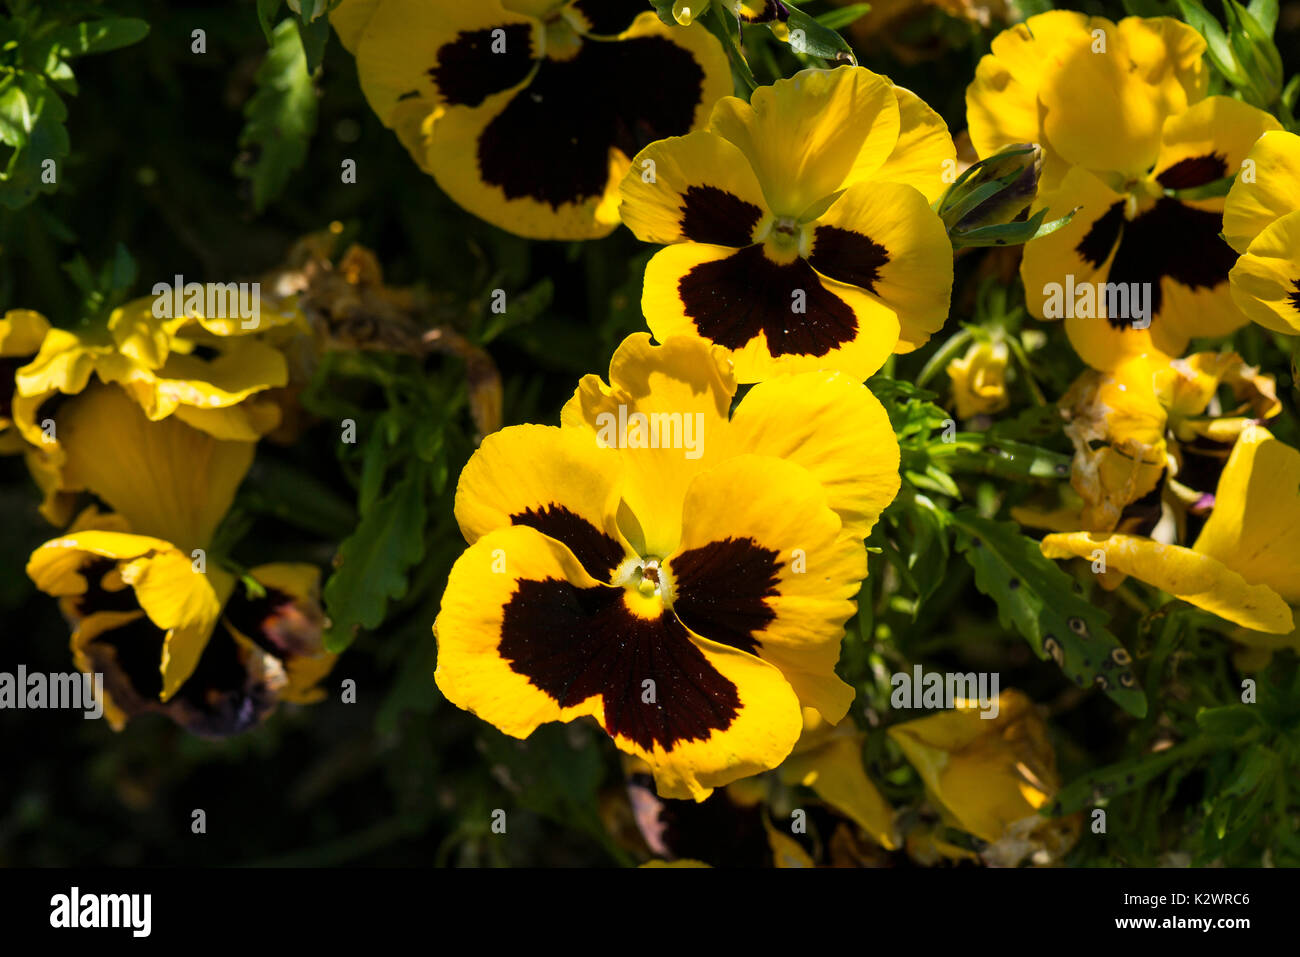 Yellow pansies (Viola tricolor var. hortensis) - Stock Image